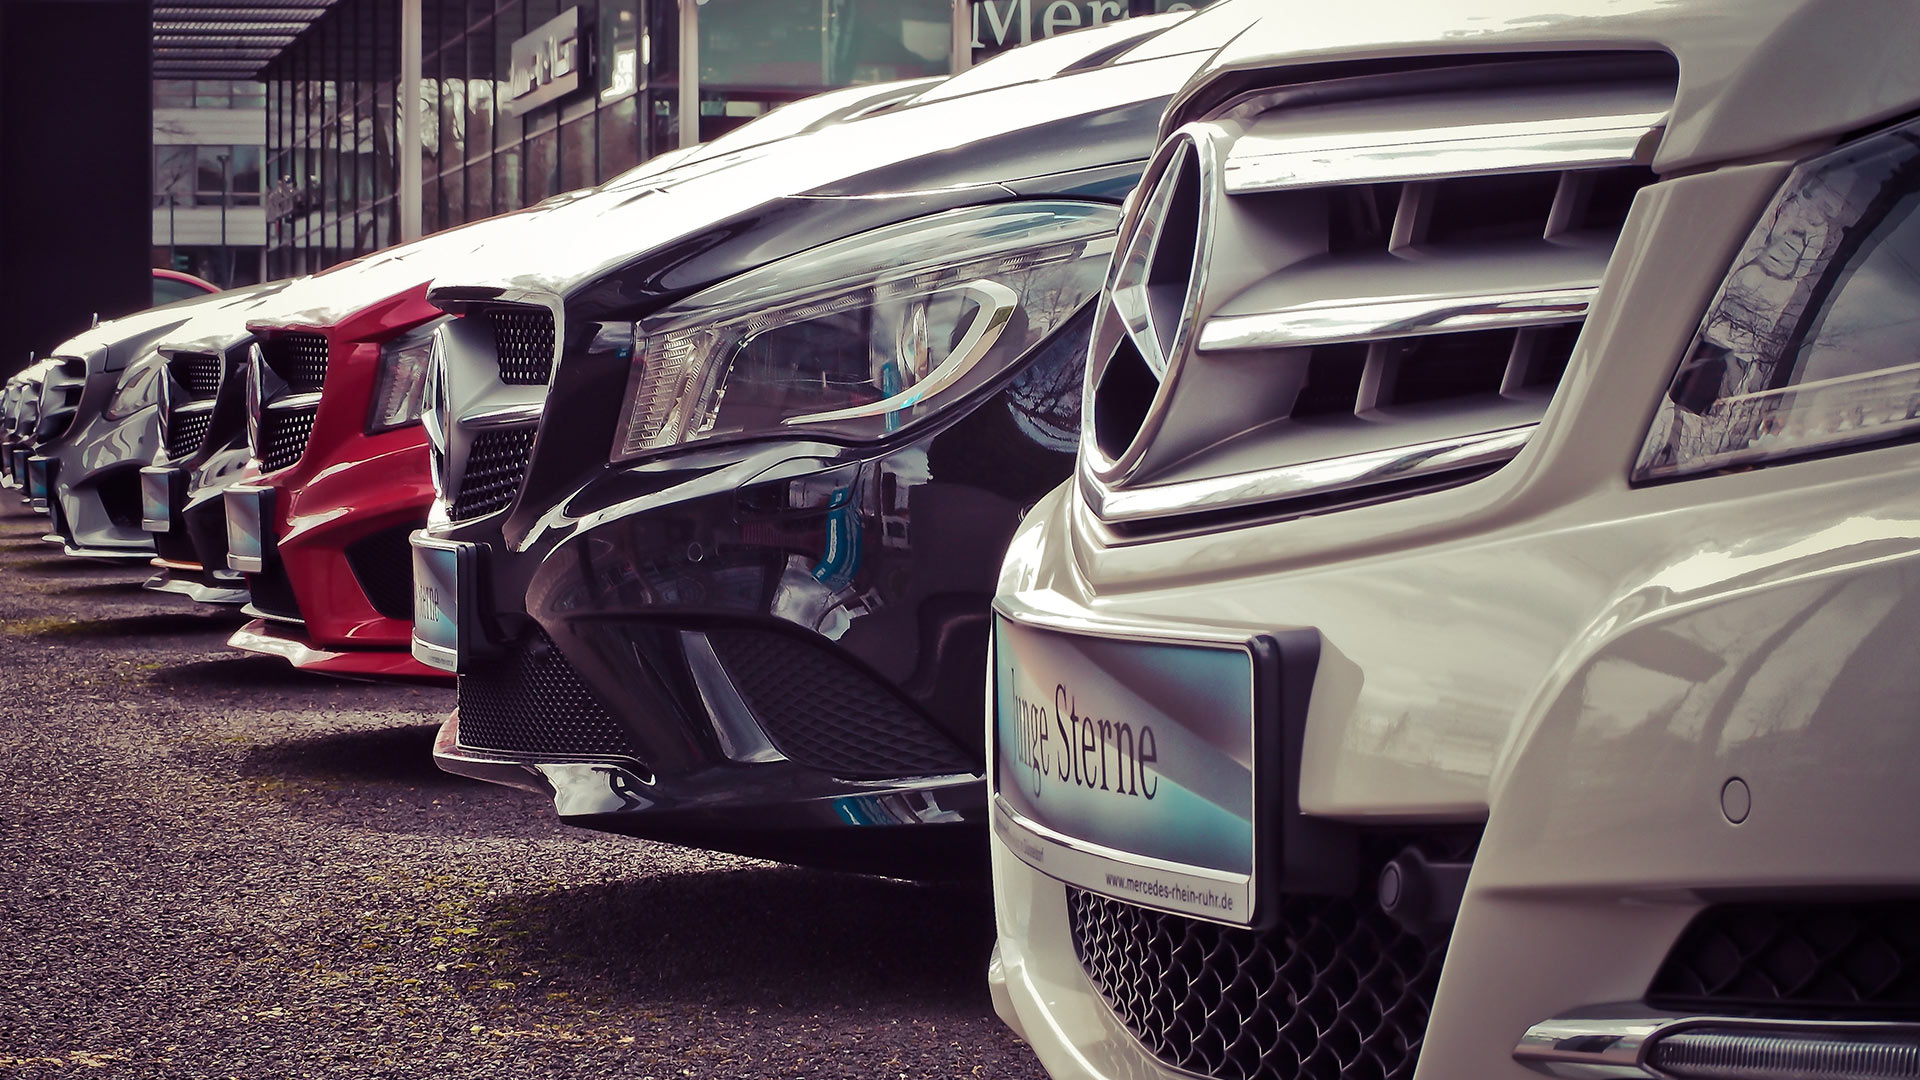 Dubai Cars & Automotive Zone